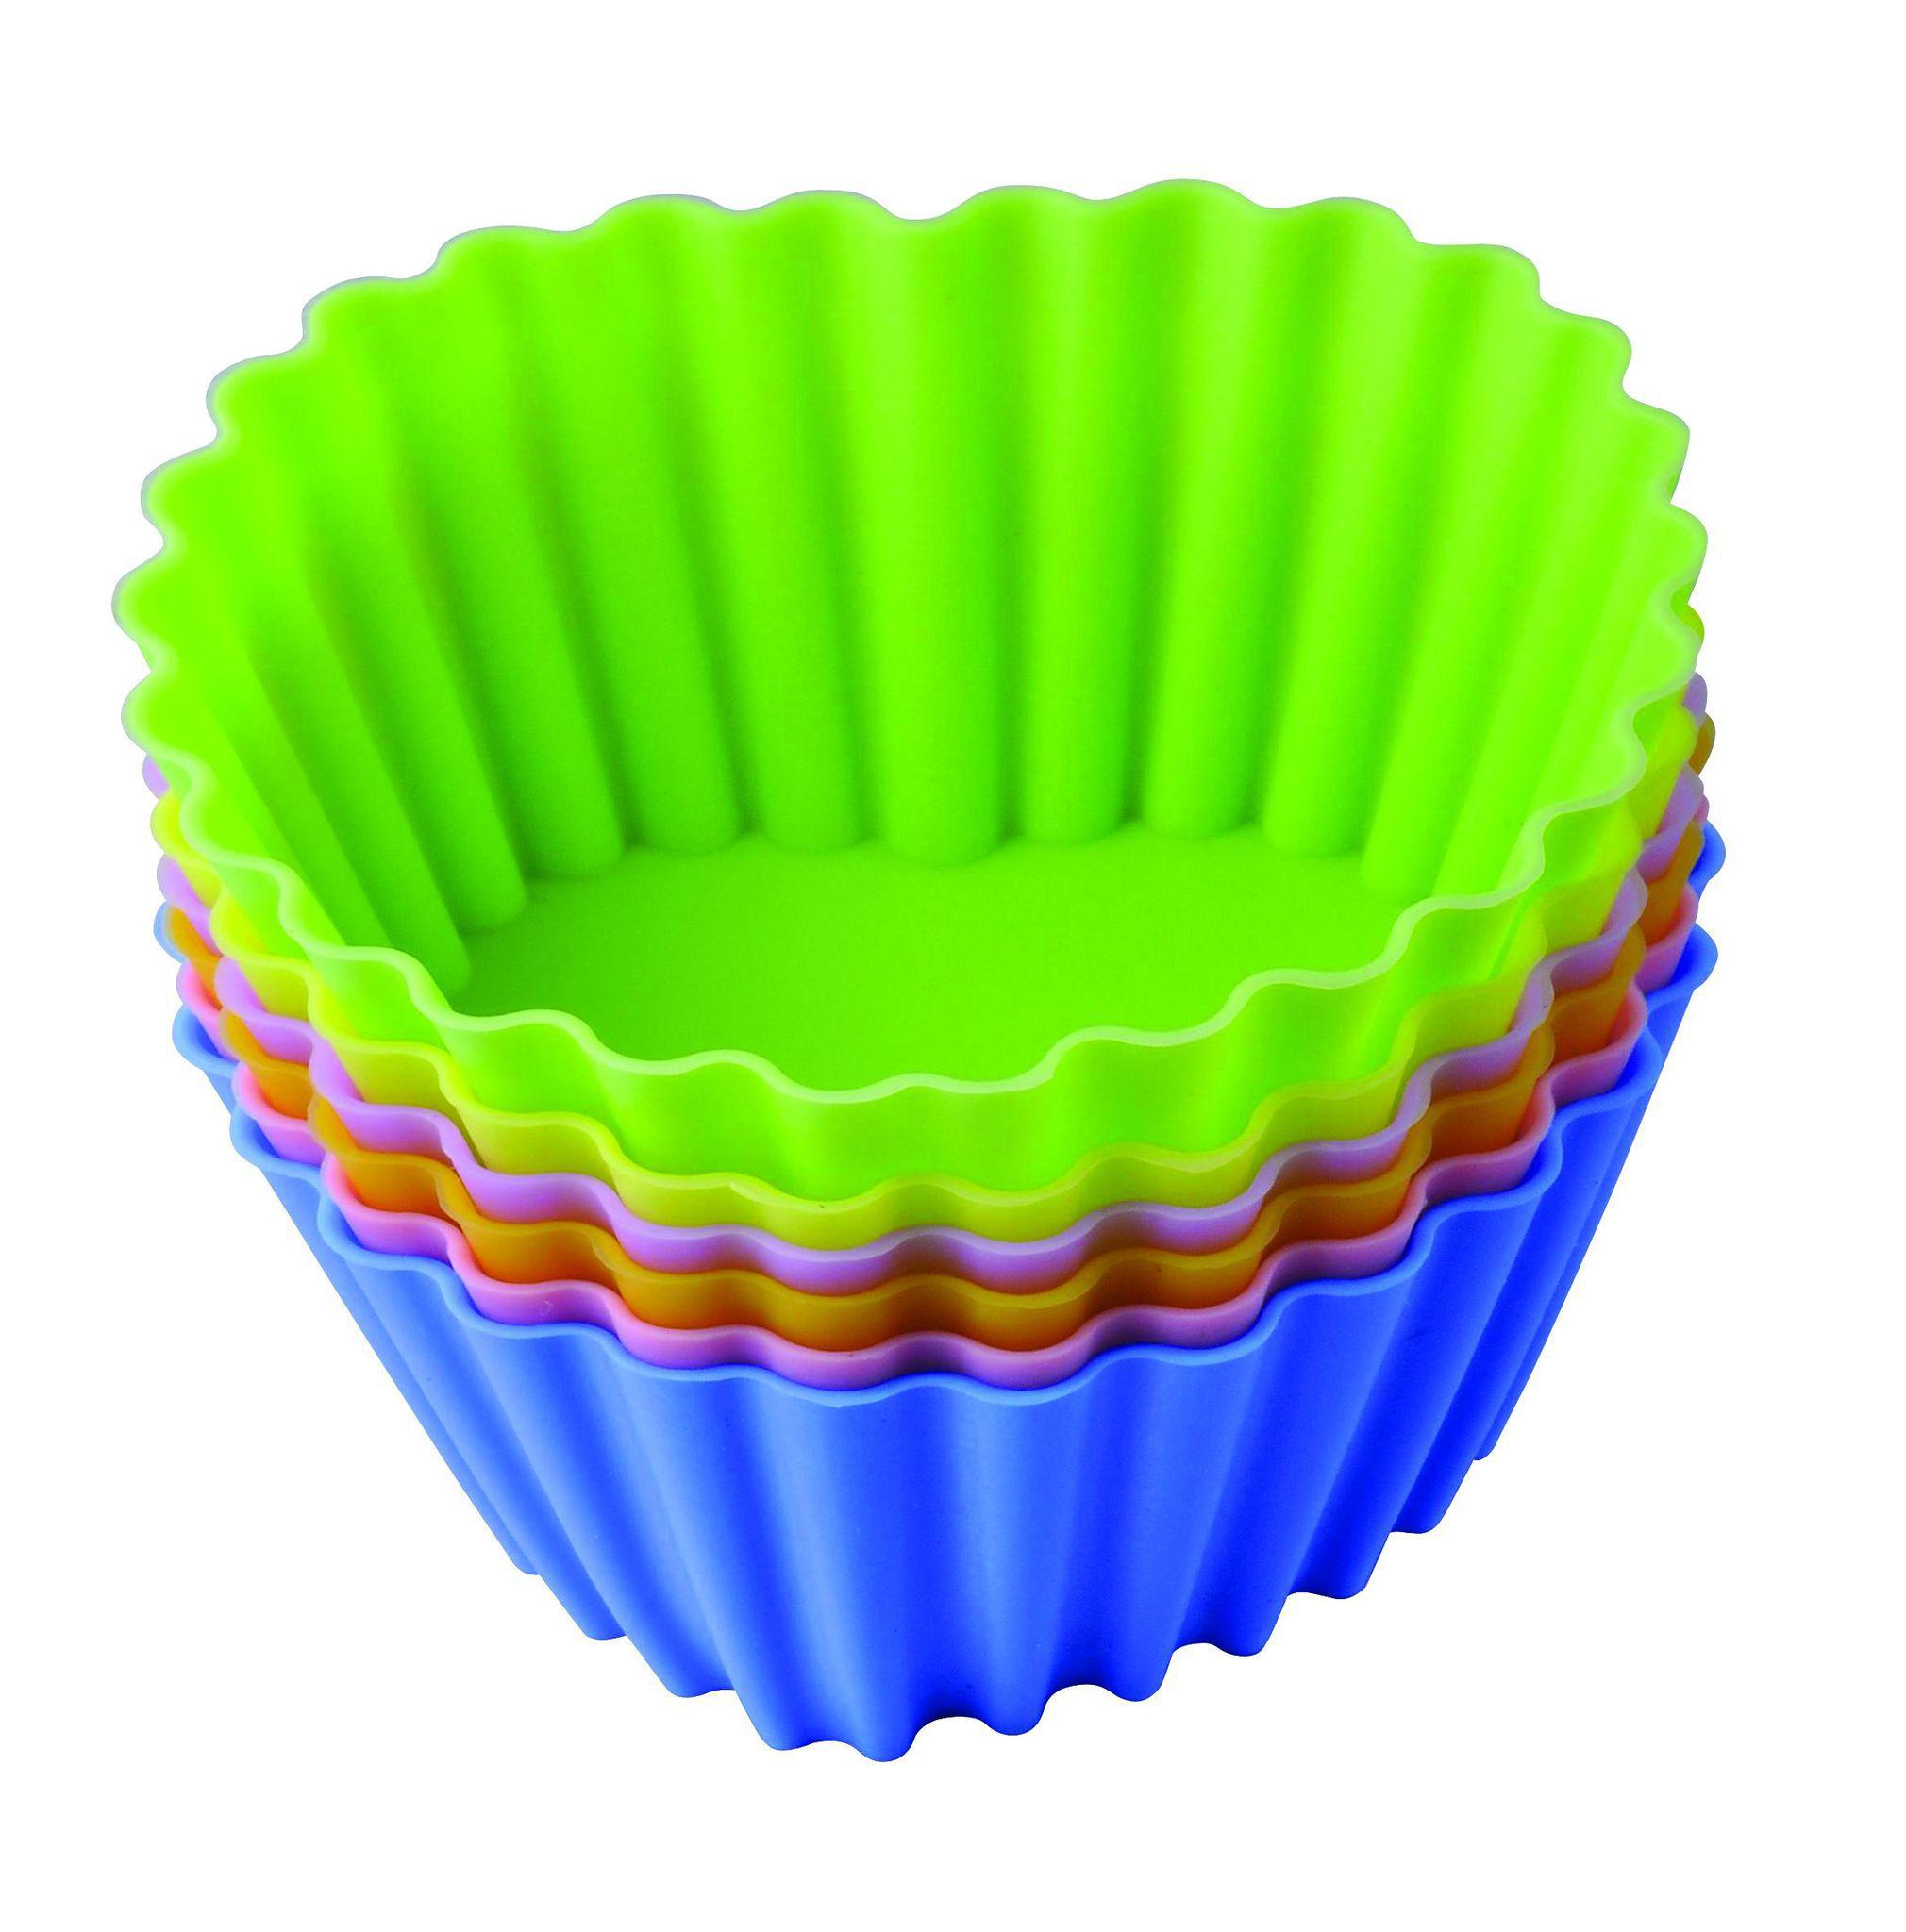 Набор Regent inoxВсе для выпечки<br>Тип: набор,<br>Материал: силикон,<br>Размер противня: 80х35мм<br>